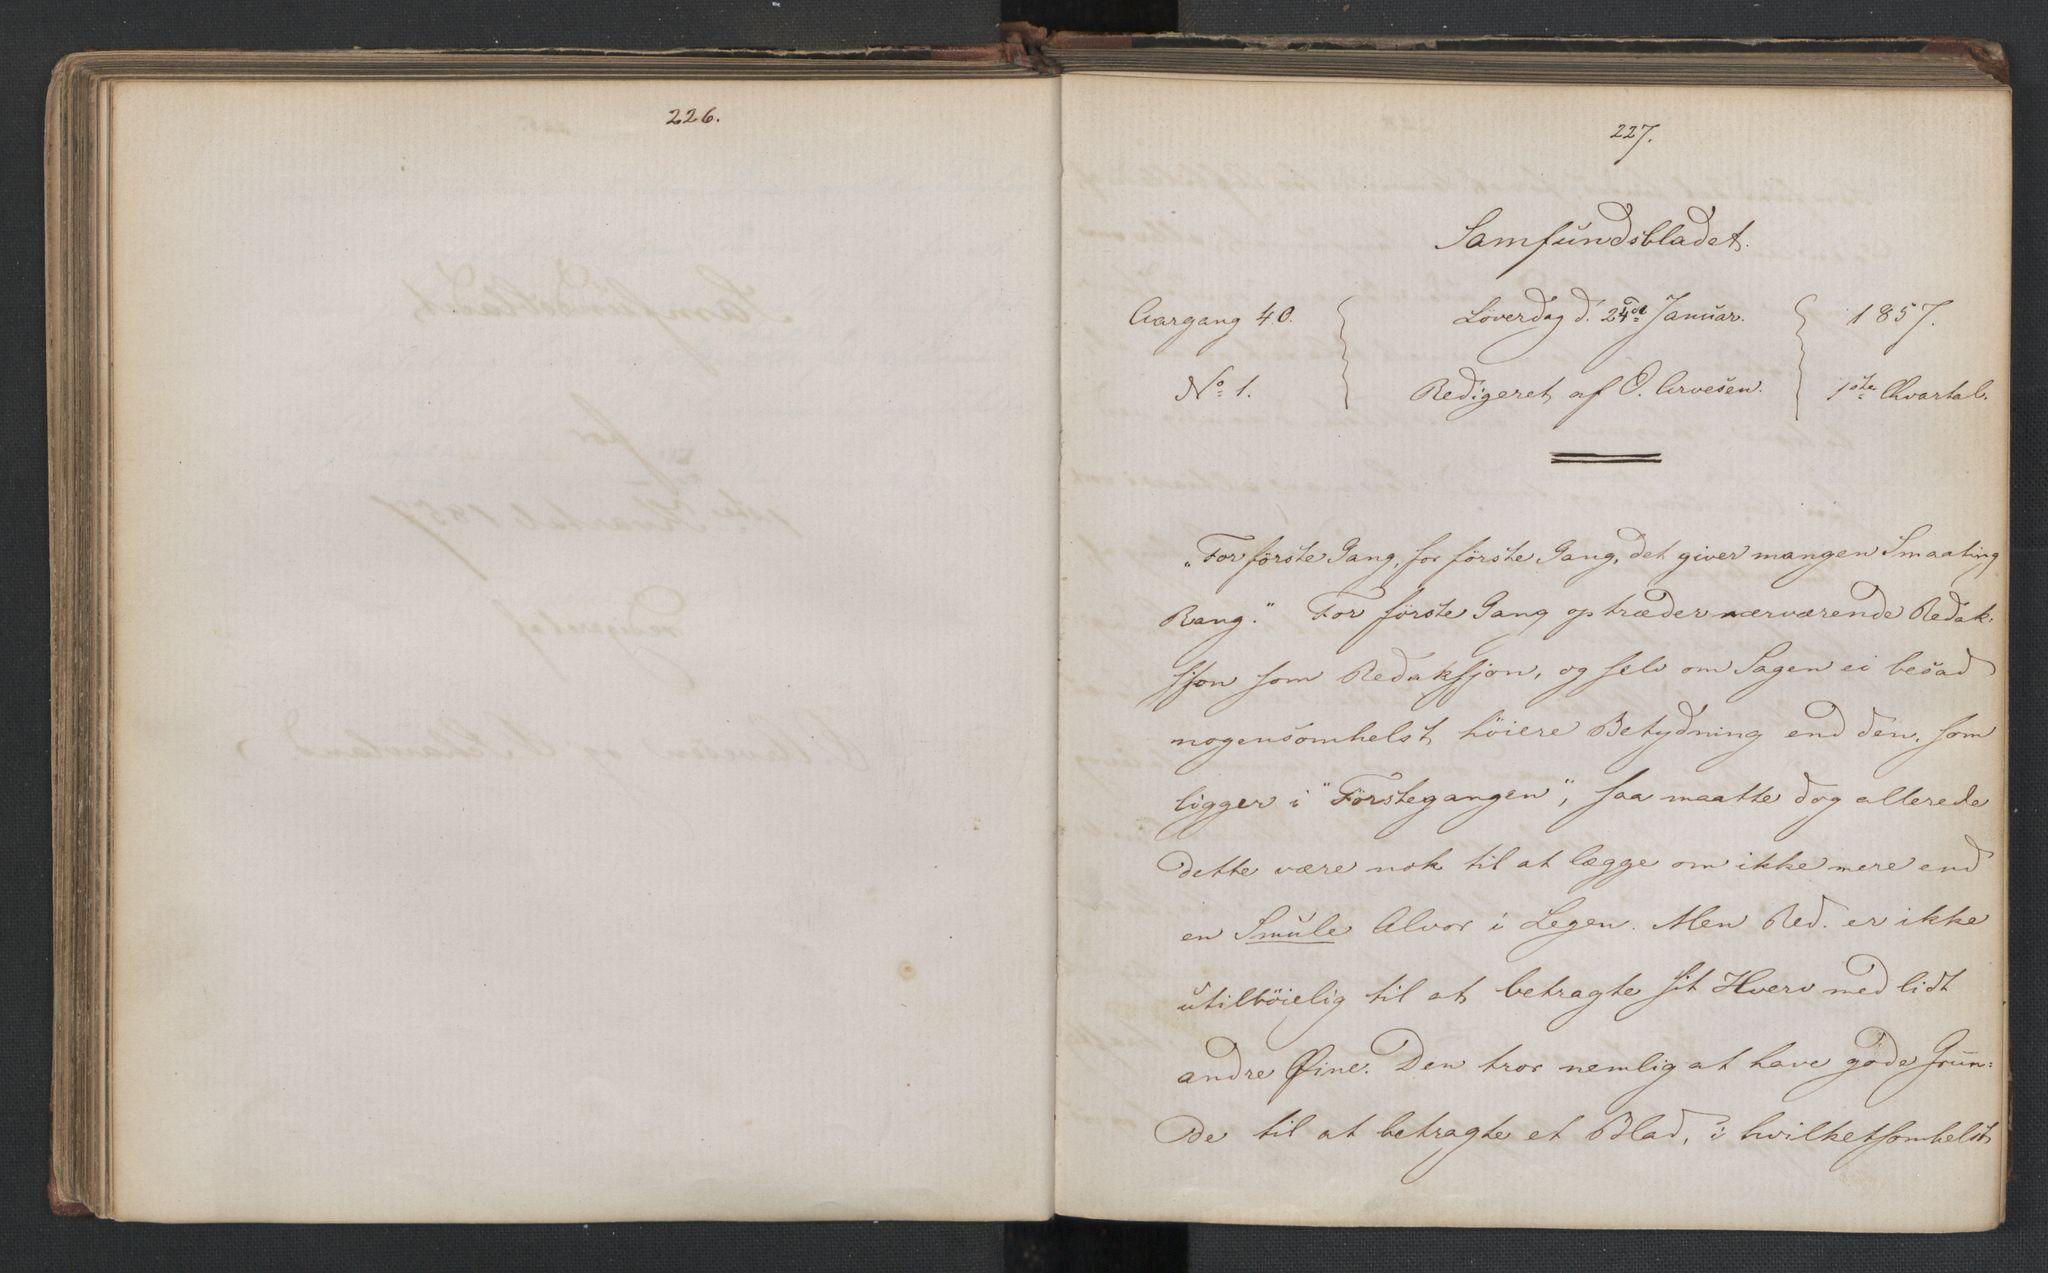 RA, Det Norske Studentersamfund, X/Xa/L0006, 1856-1857, s. 117